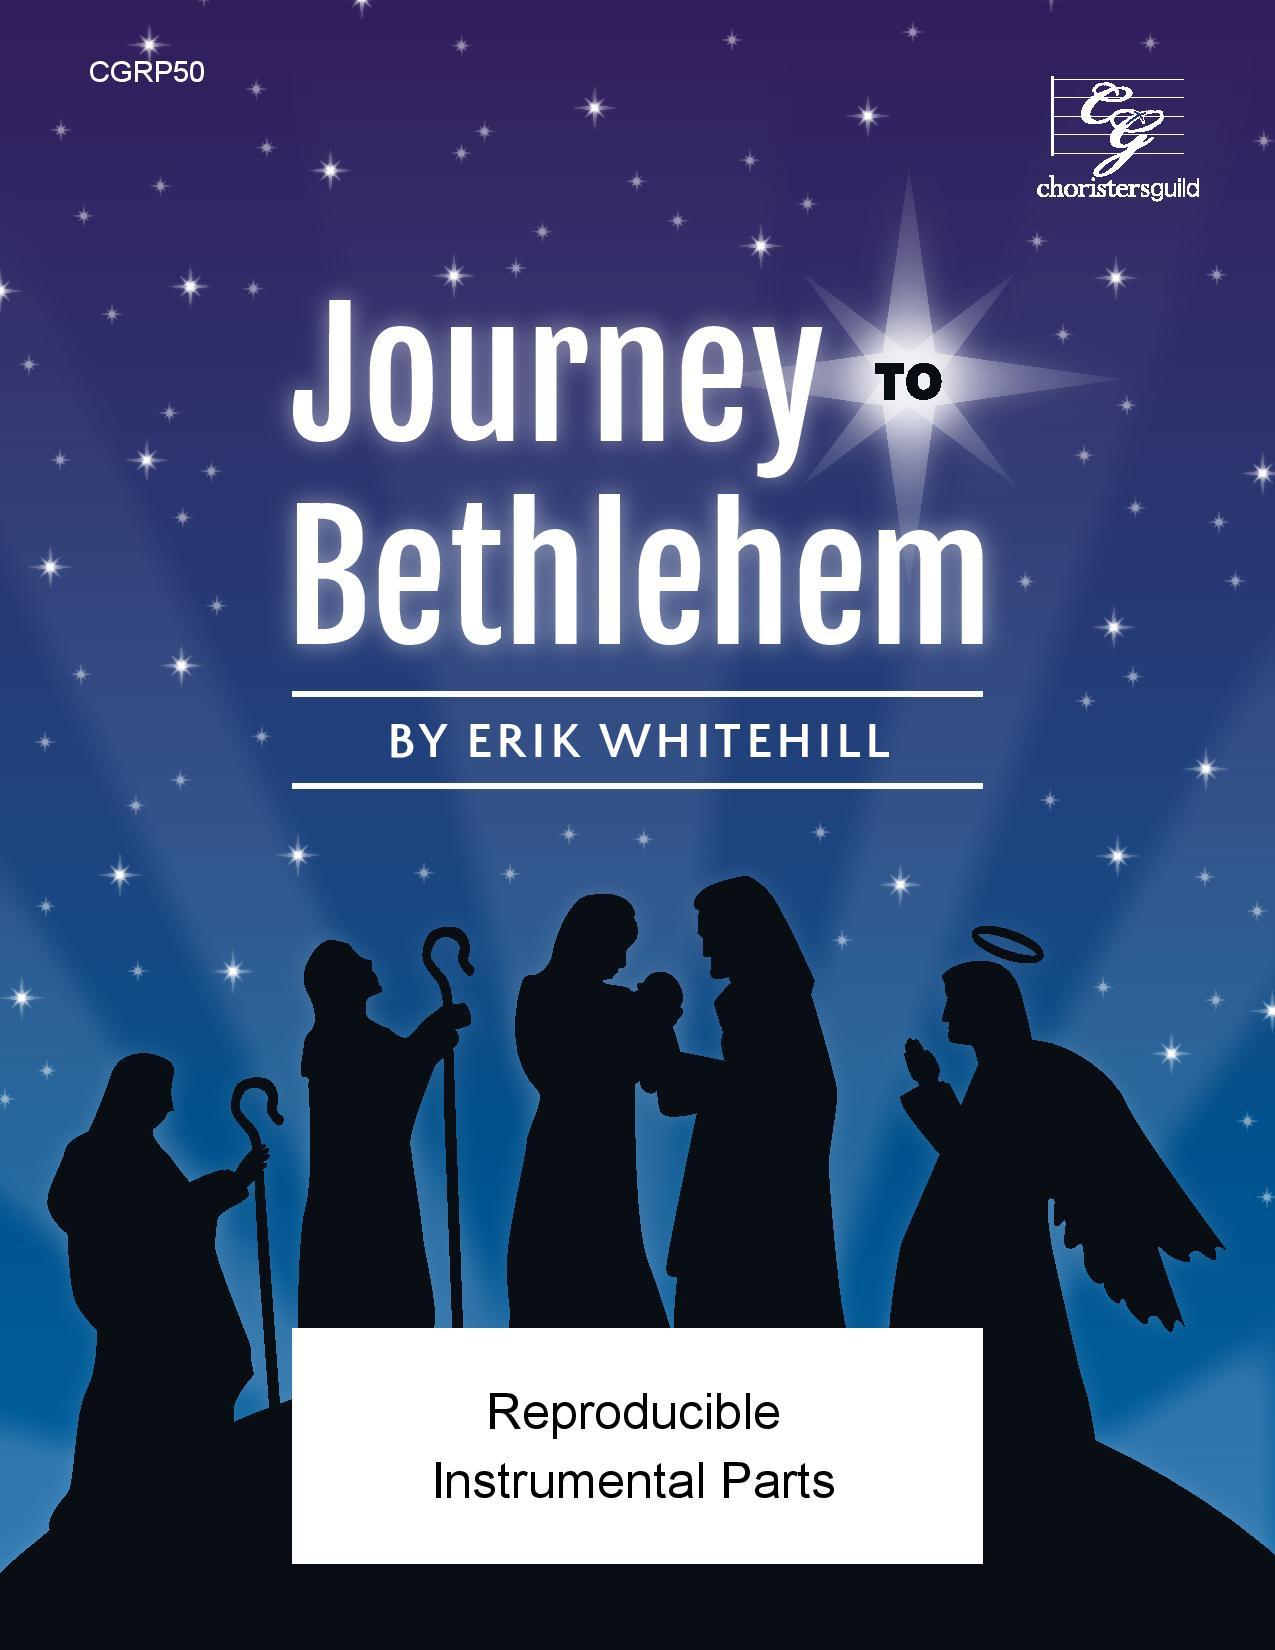 Journey to Bethlehem - Reproducible Instrumental Parts